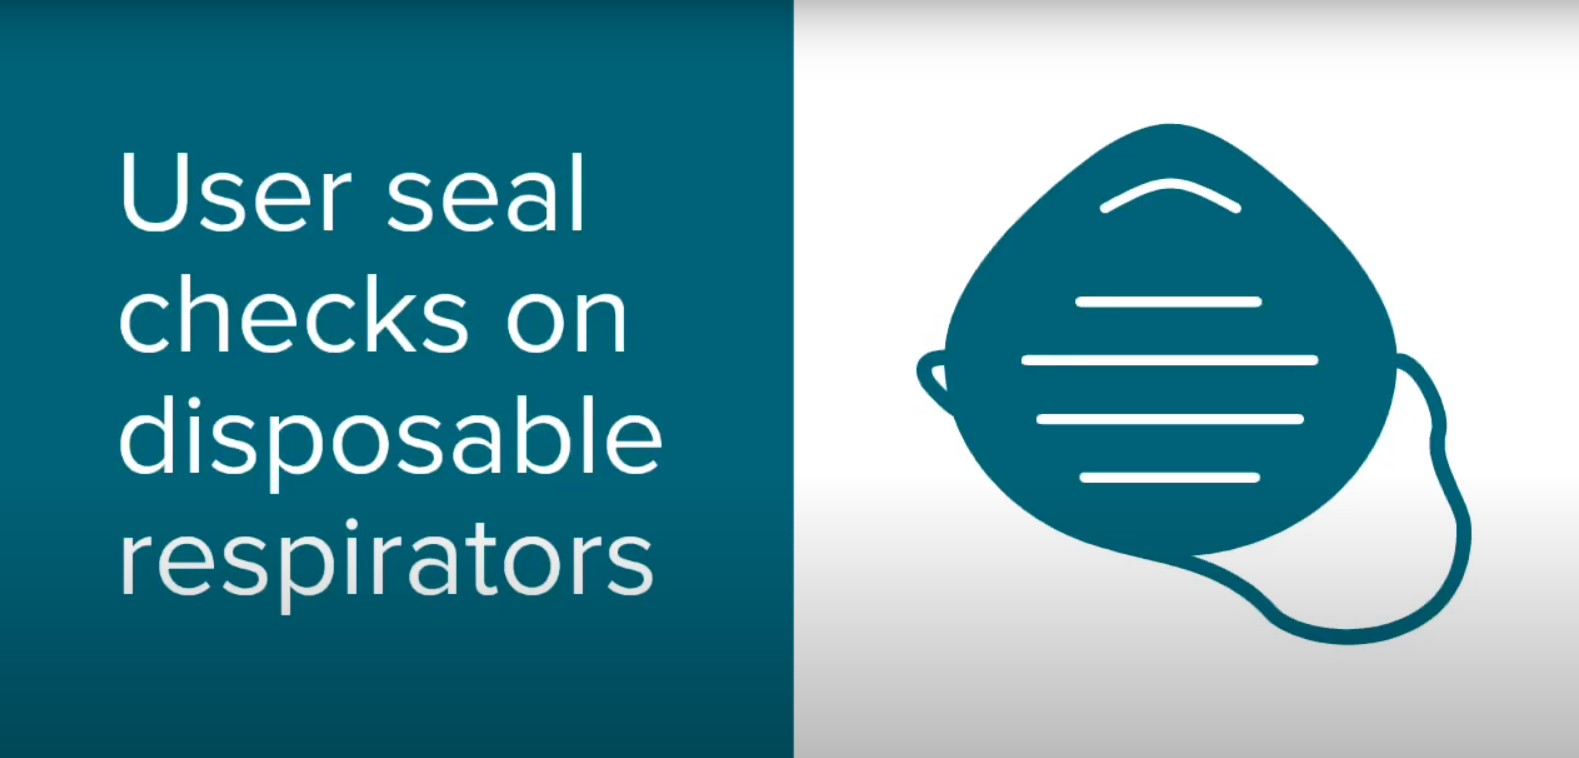 User Seal Checks for Disposable Respirators Video